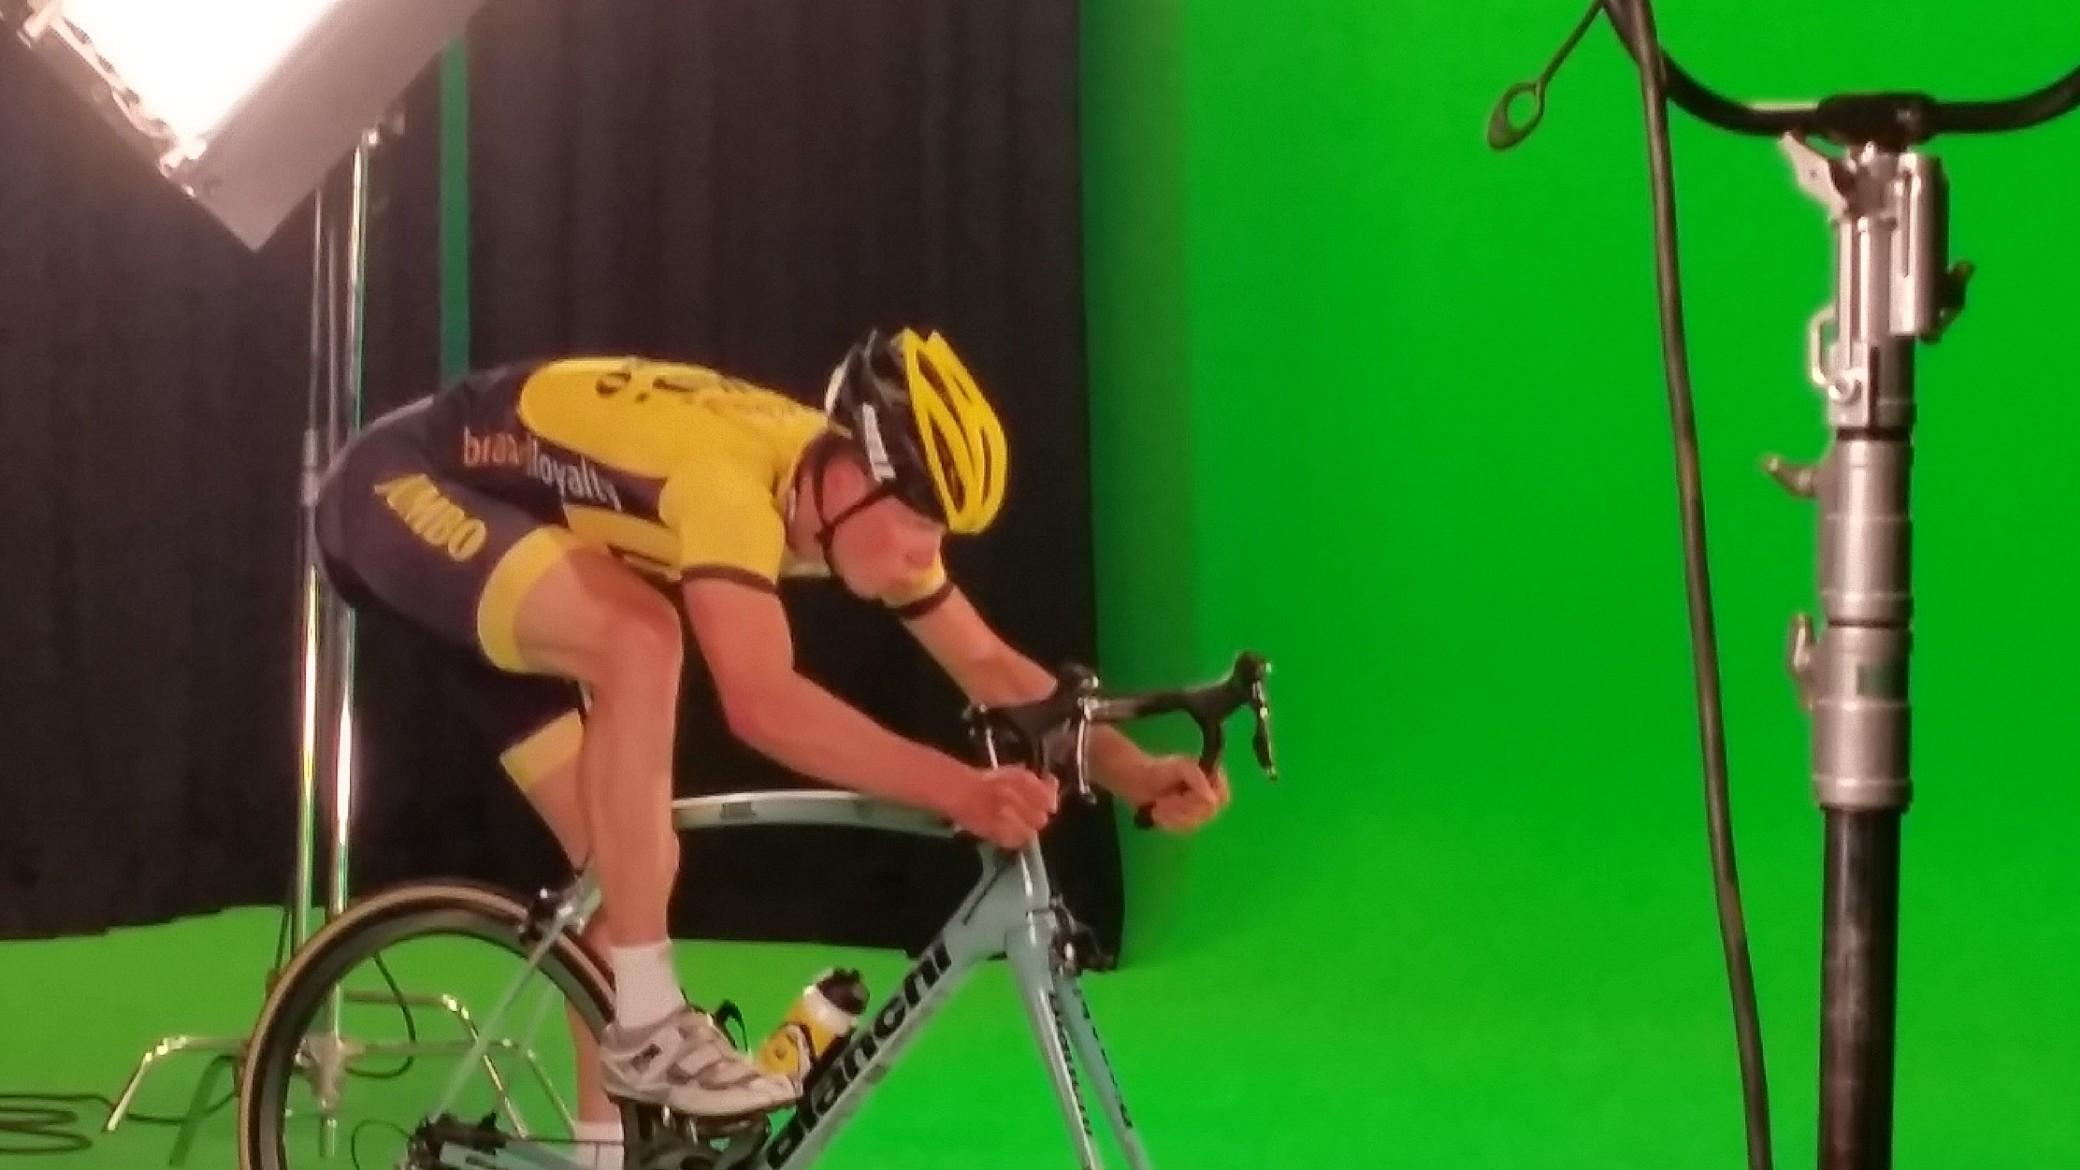 wielrenner greenscreen studio